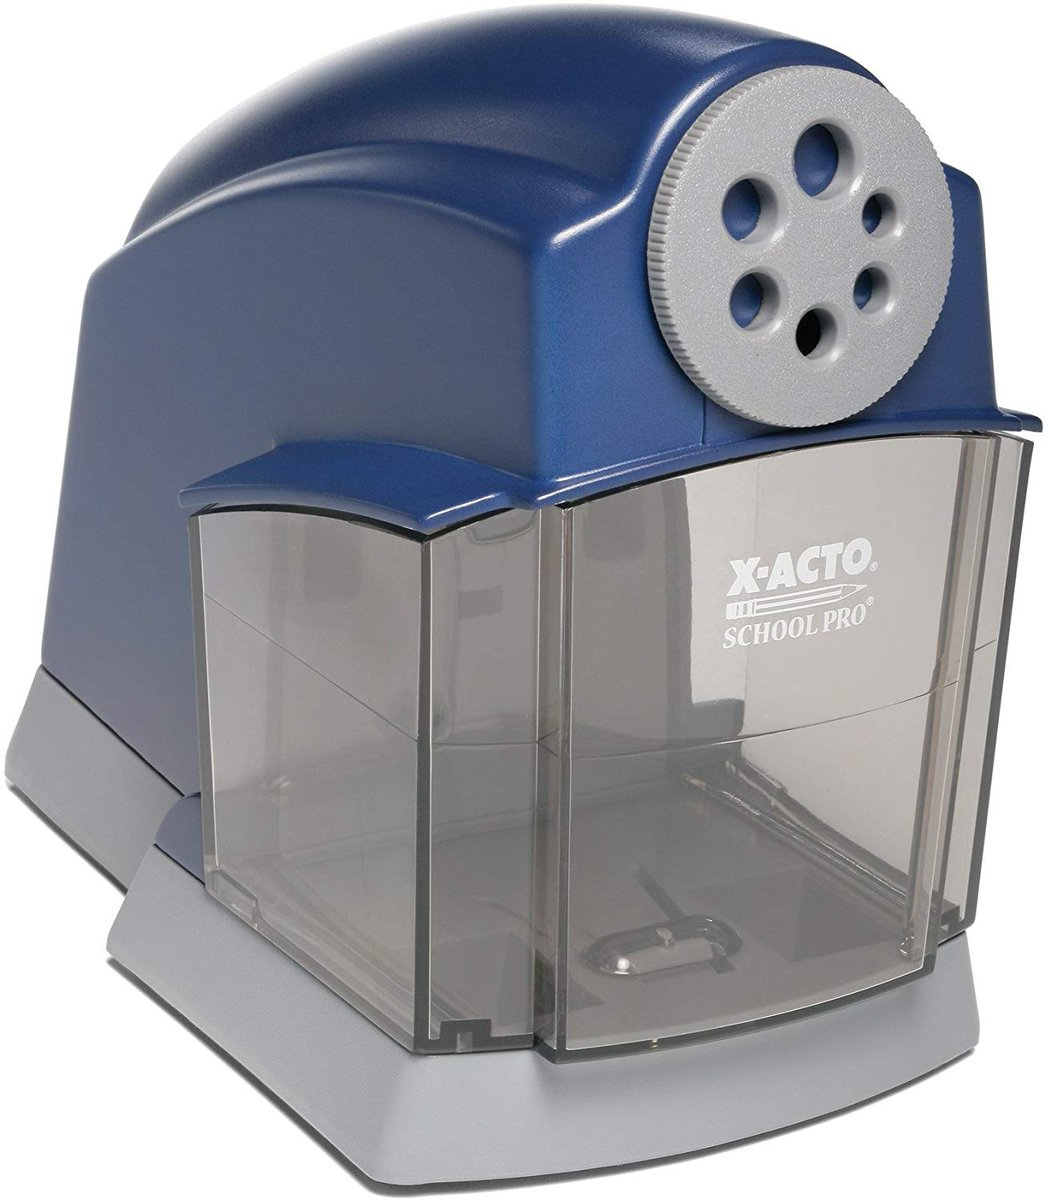 Lowest Price Ever!!! $27  X-ACTO School Pro Classroom Electric Pencil Sharpener, Blue,     #BwcDeals #Deals #dailydeals #pencil #sharpener